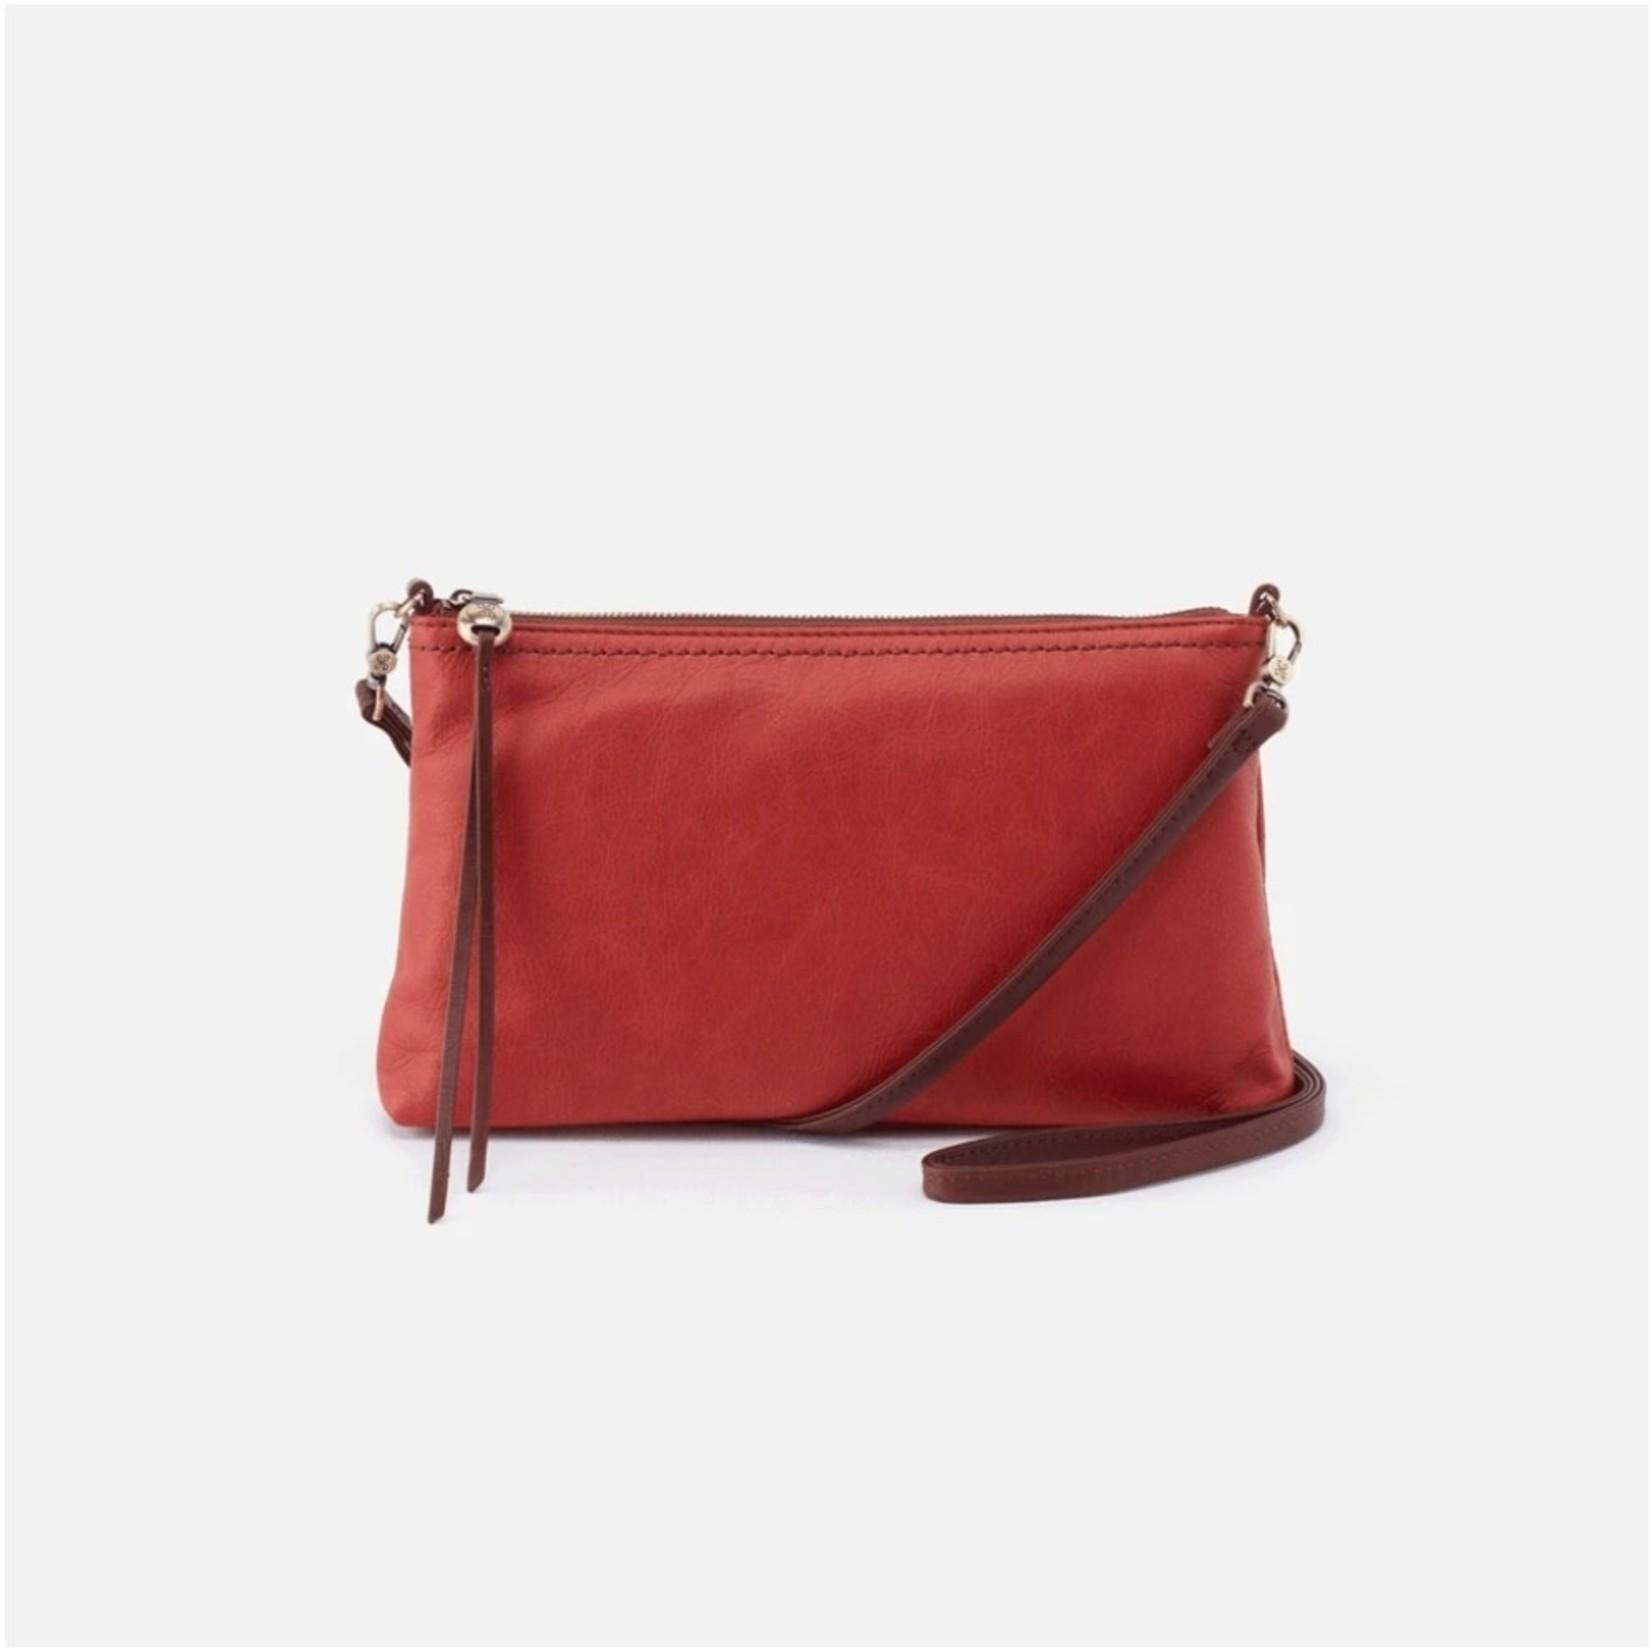 HOBO Darcy Brick Leather Wristlet/Crossbody